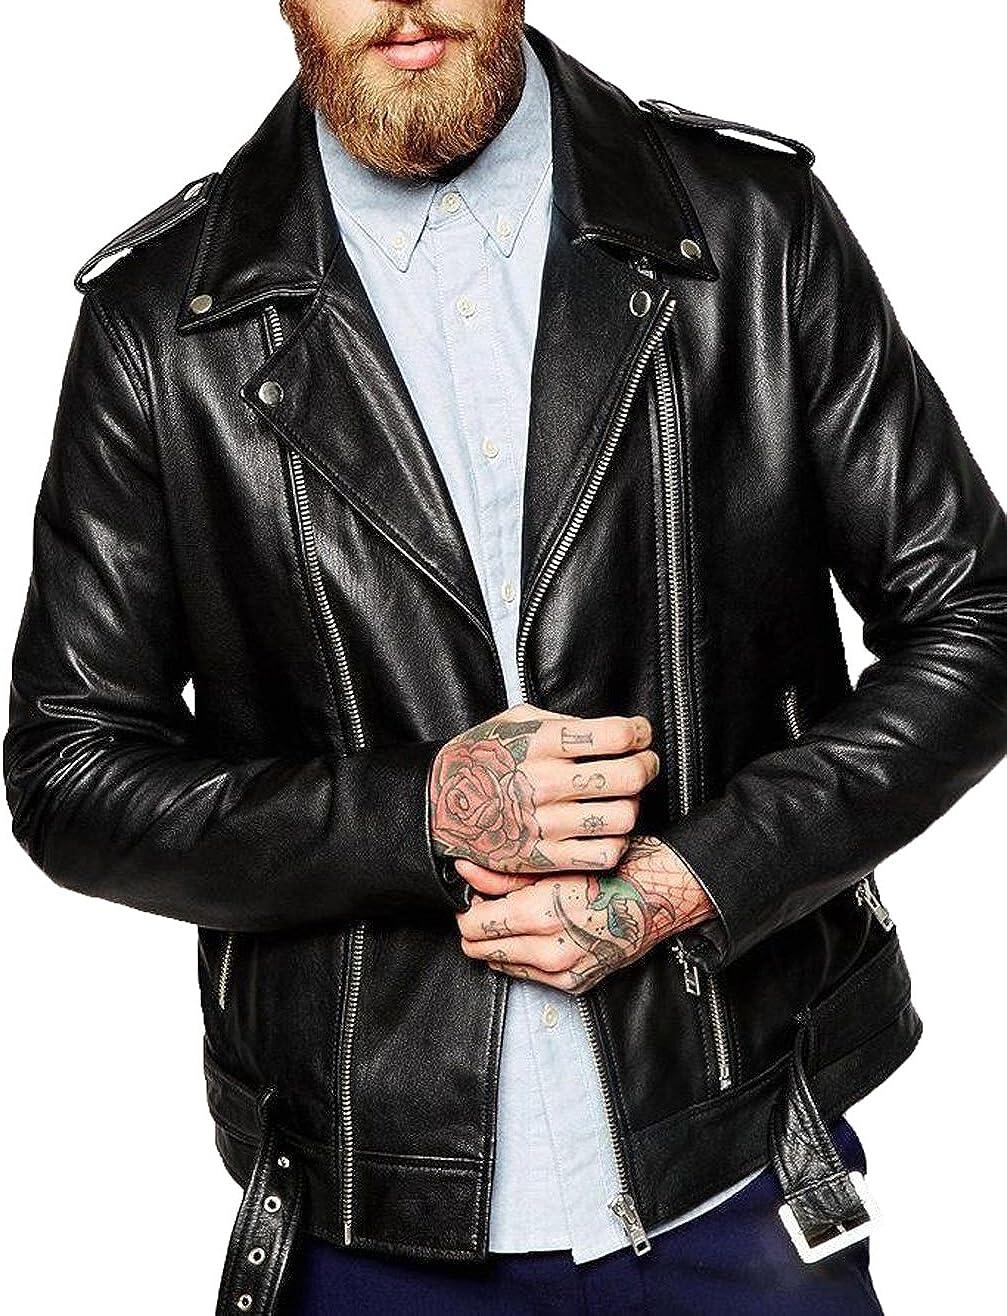 Kingdom Leather New Genuine Cow Leather Designer Jacket Motorcycle Biker Mens S M L XL XC966